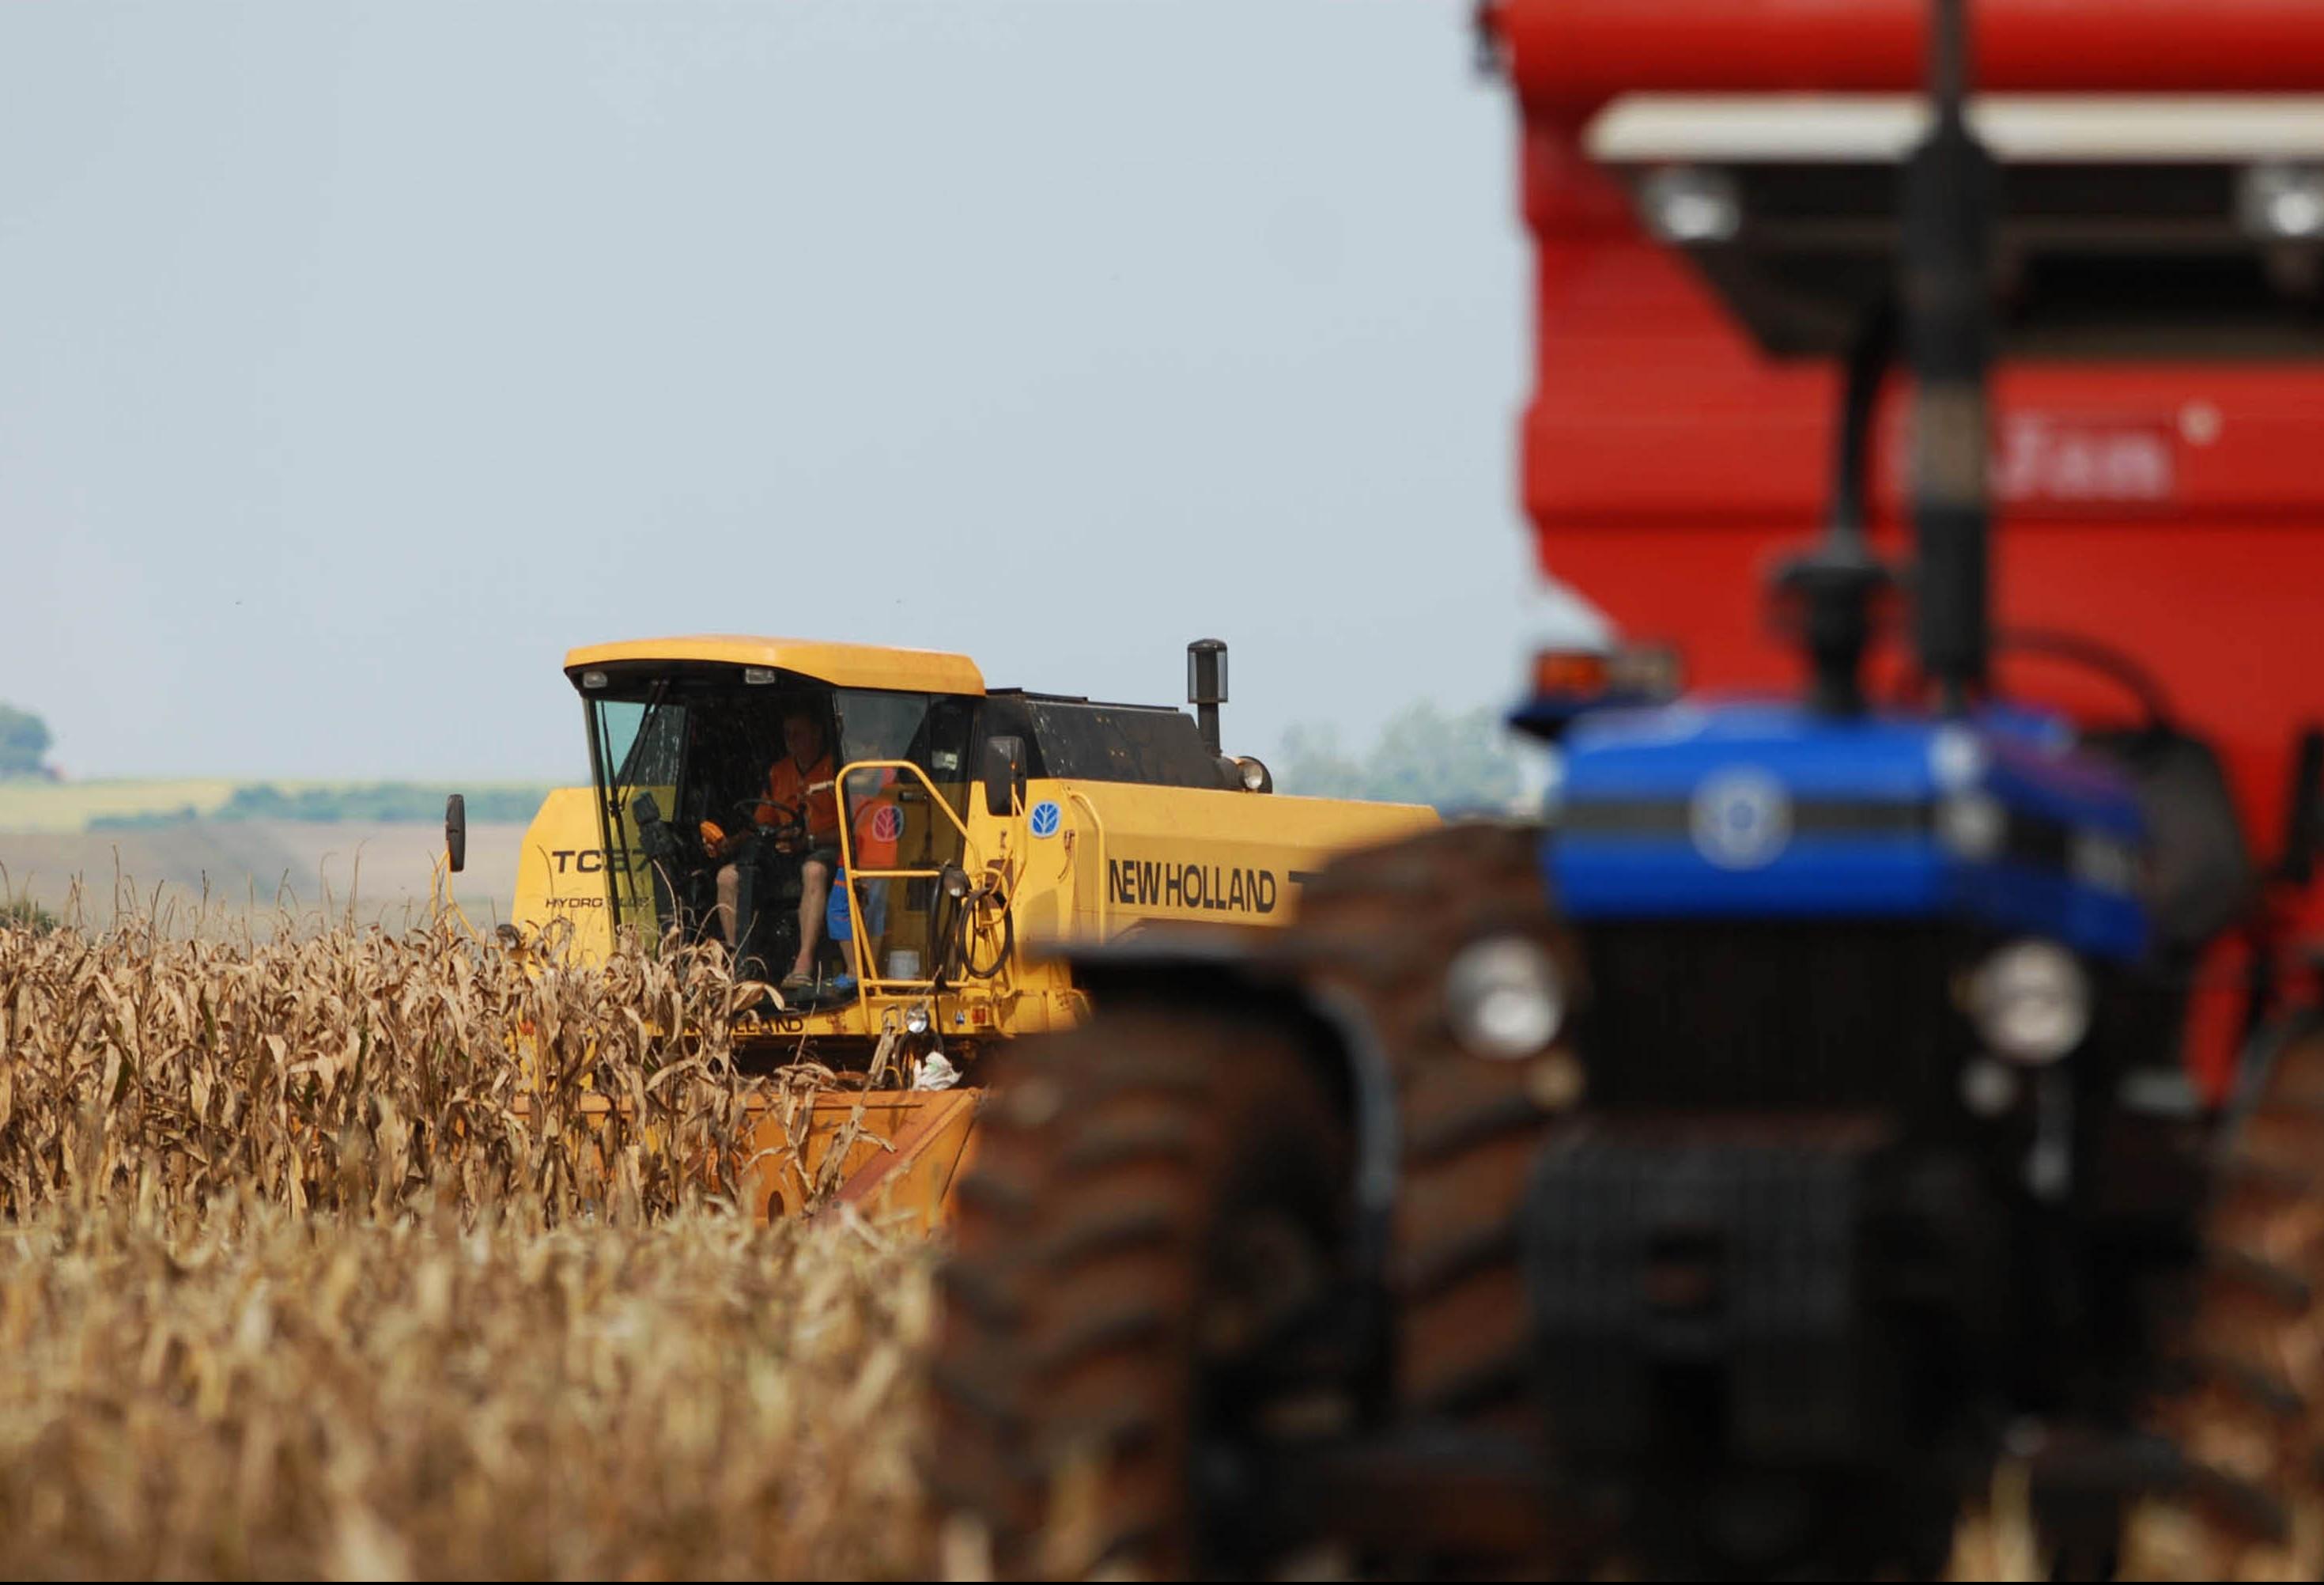 Aumento da demanda por crédito rural a juros controlados preocupa bancos e o governo